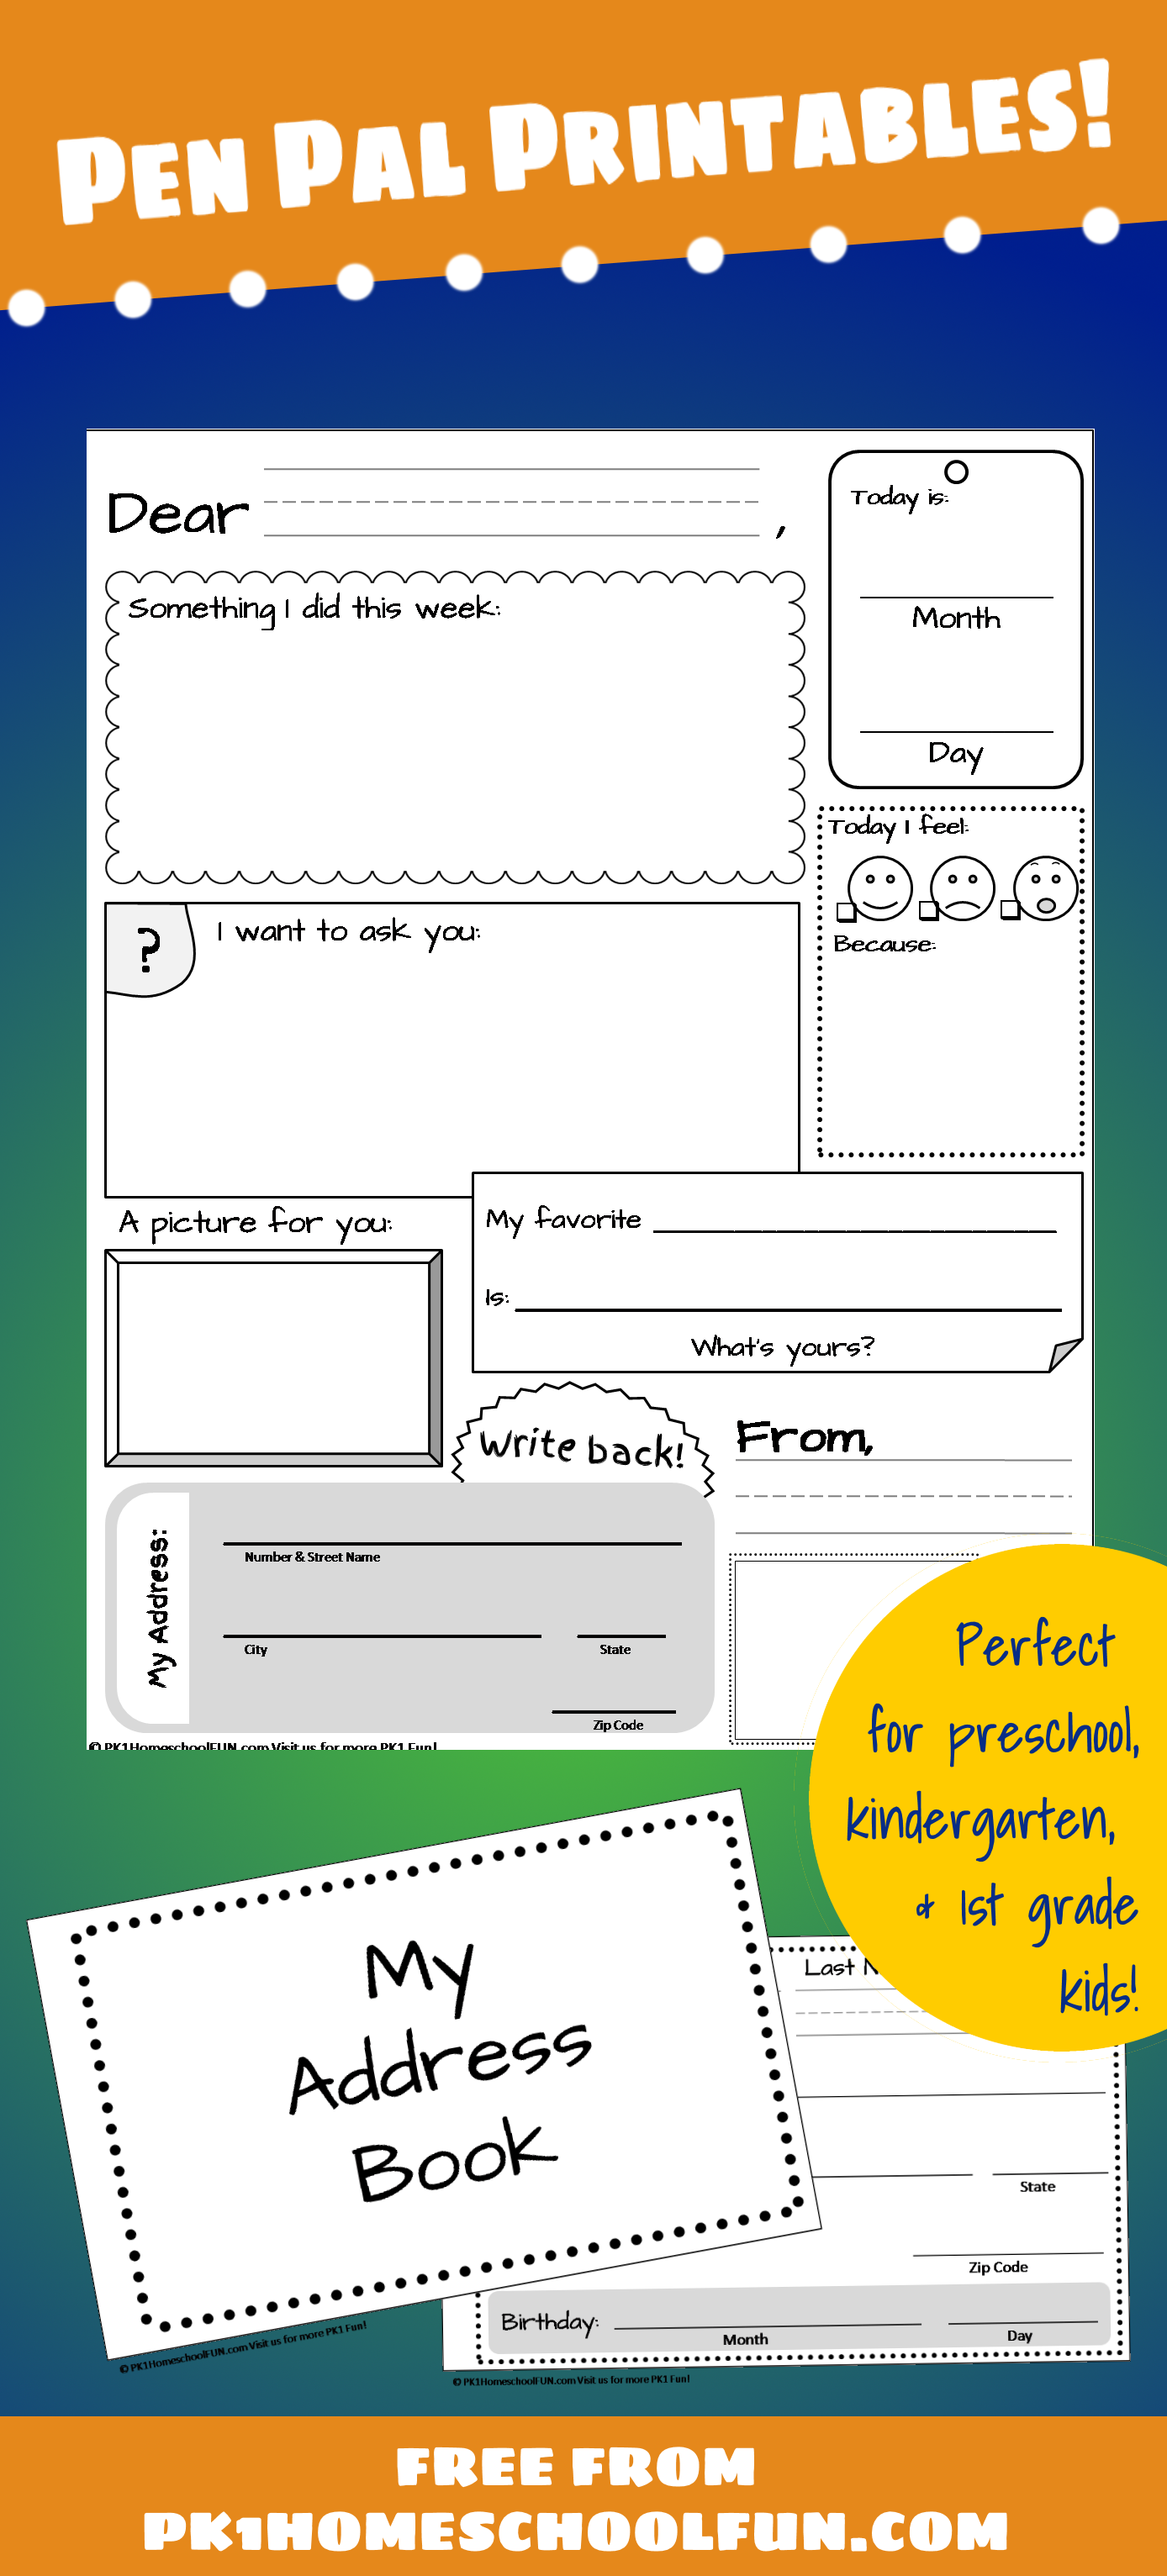 Pen Pal Printables For Pk1kids